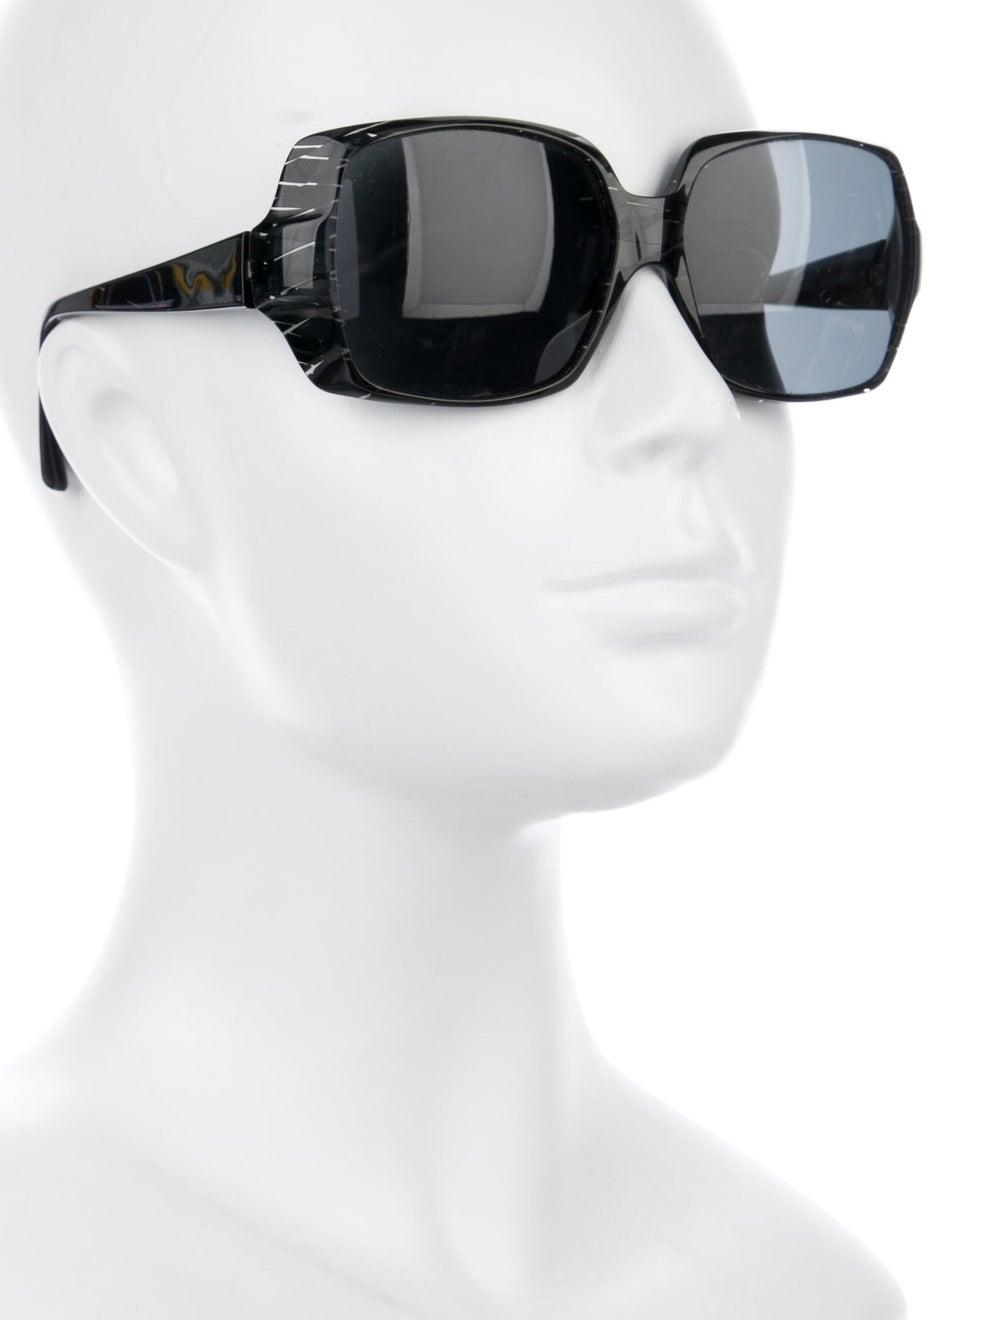 Alain Mikli Tinted Square Sunglasses Black - image 4